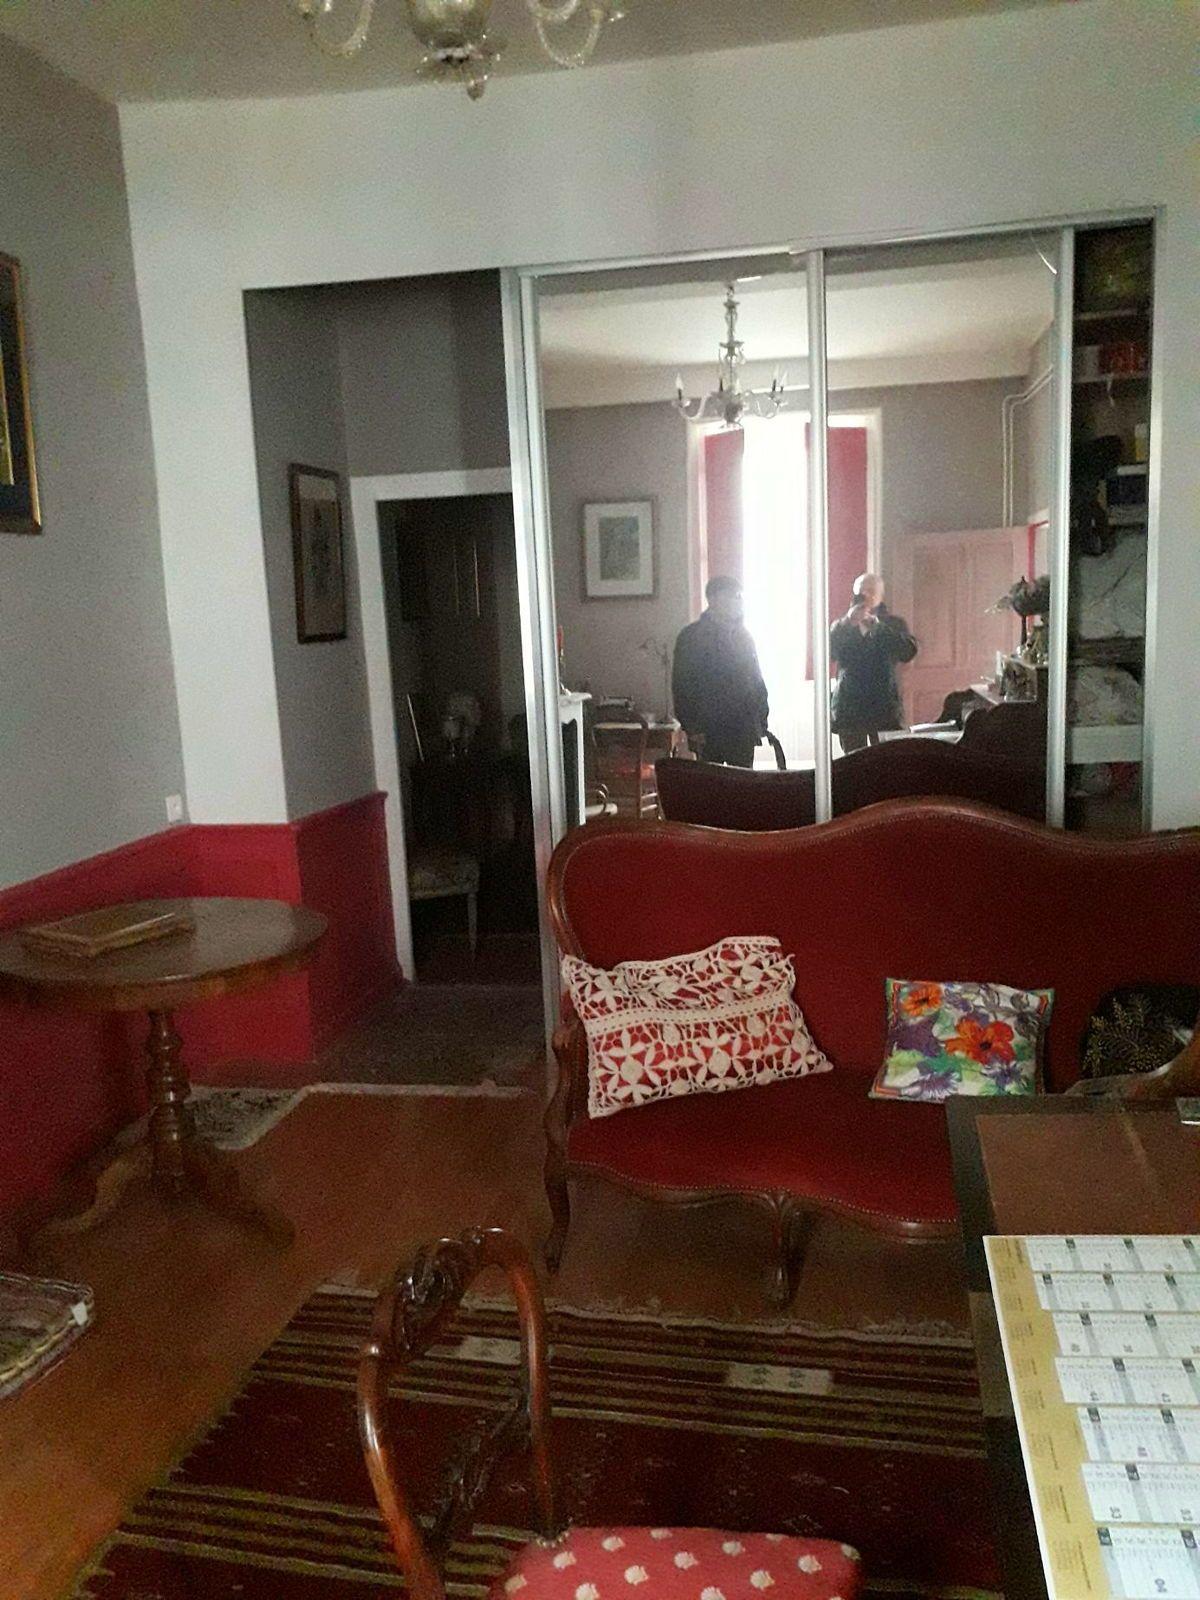 Loue appartement T4-5de 110m² à Bourgoin-Jallieu (38)